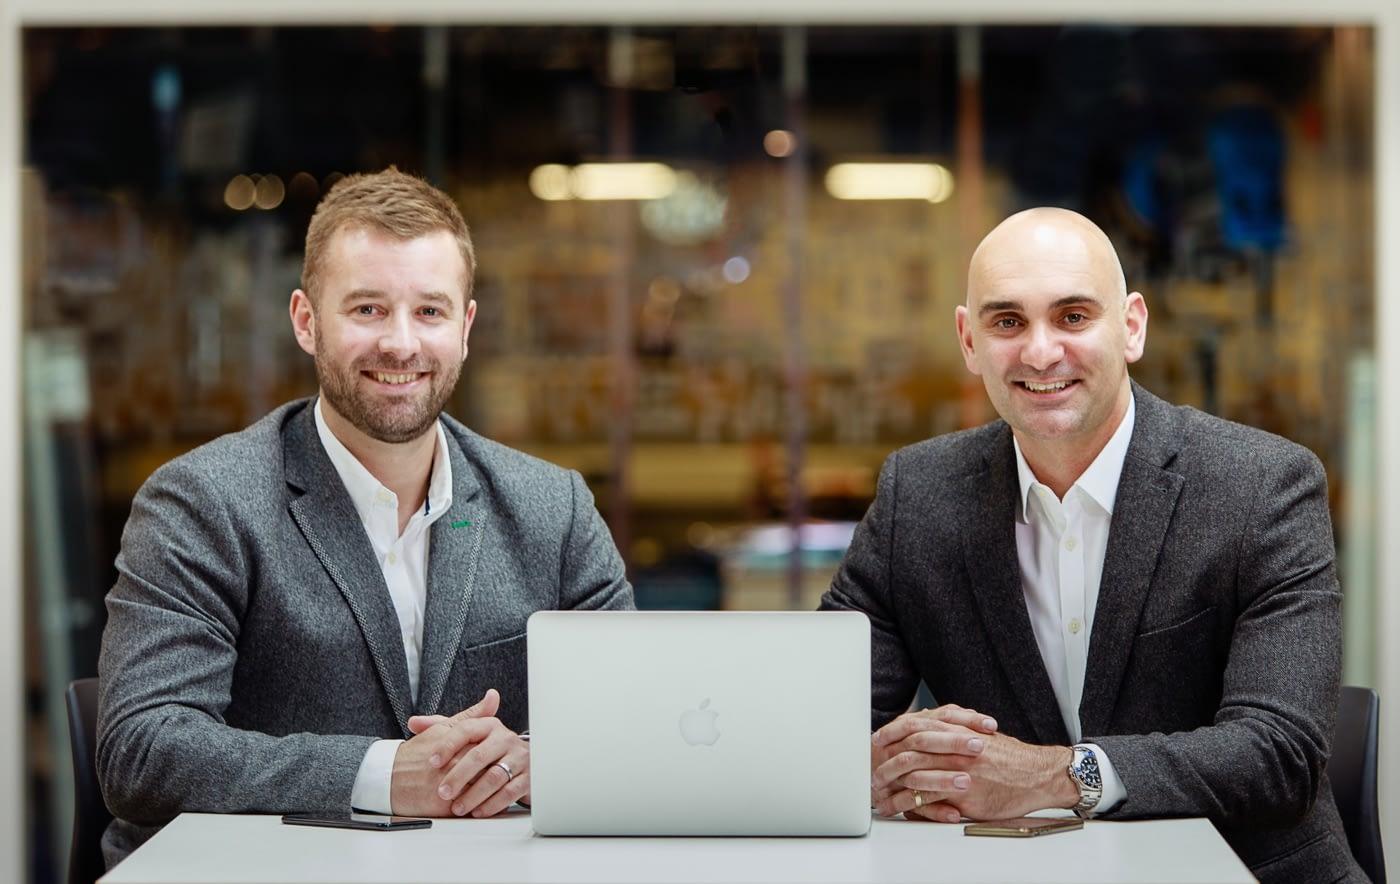 Damian Hanson and David Hague founded CircleLoop developer Mission Labs